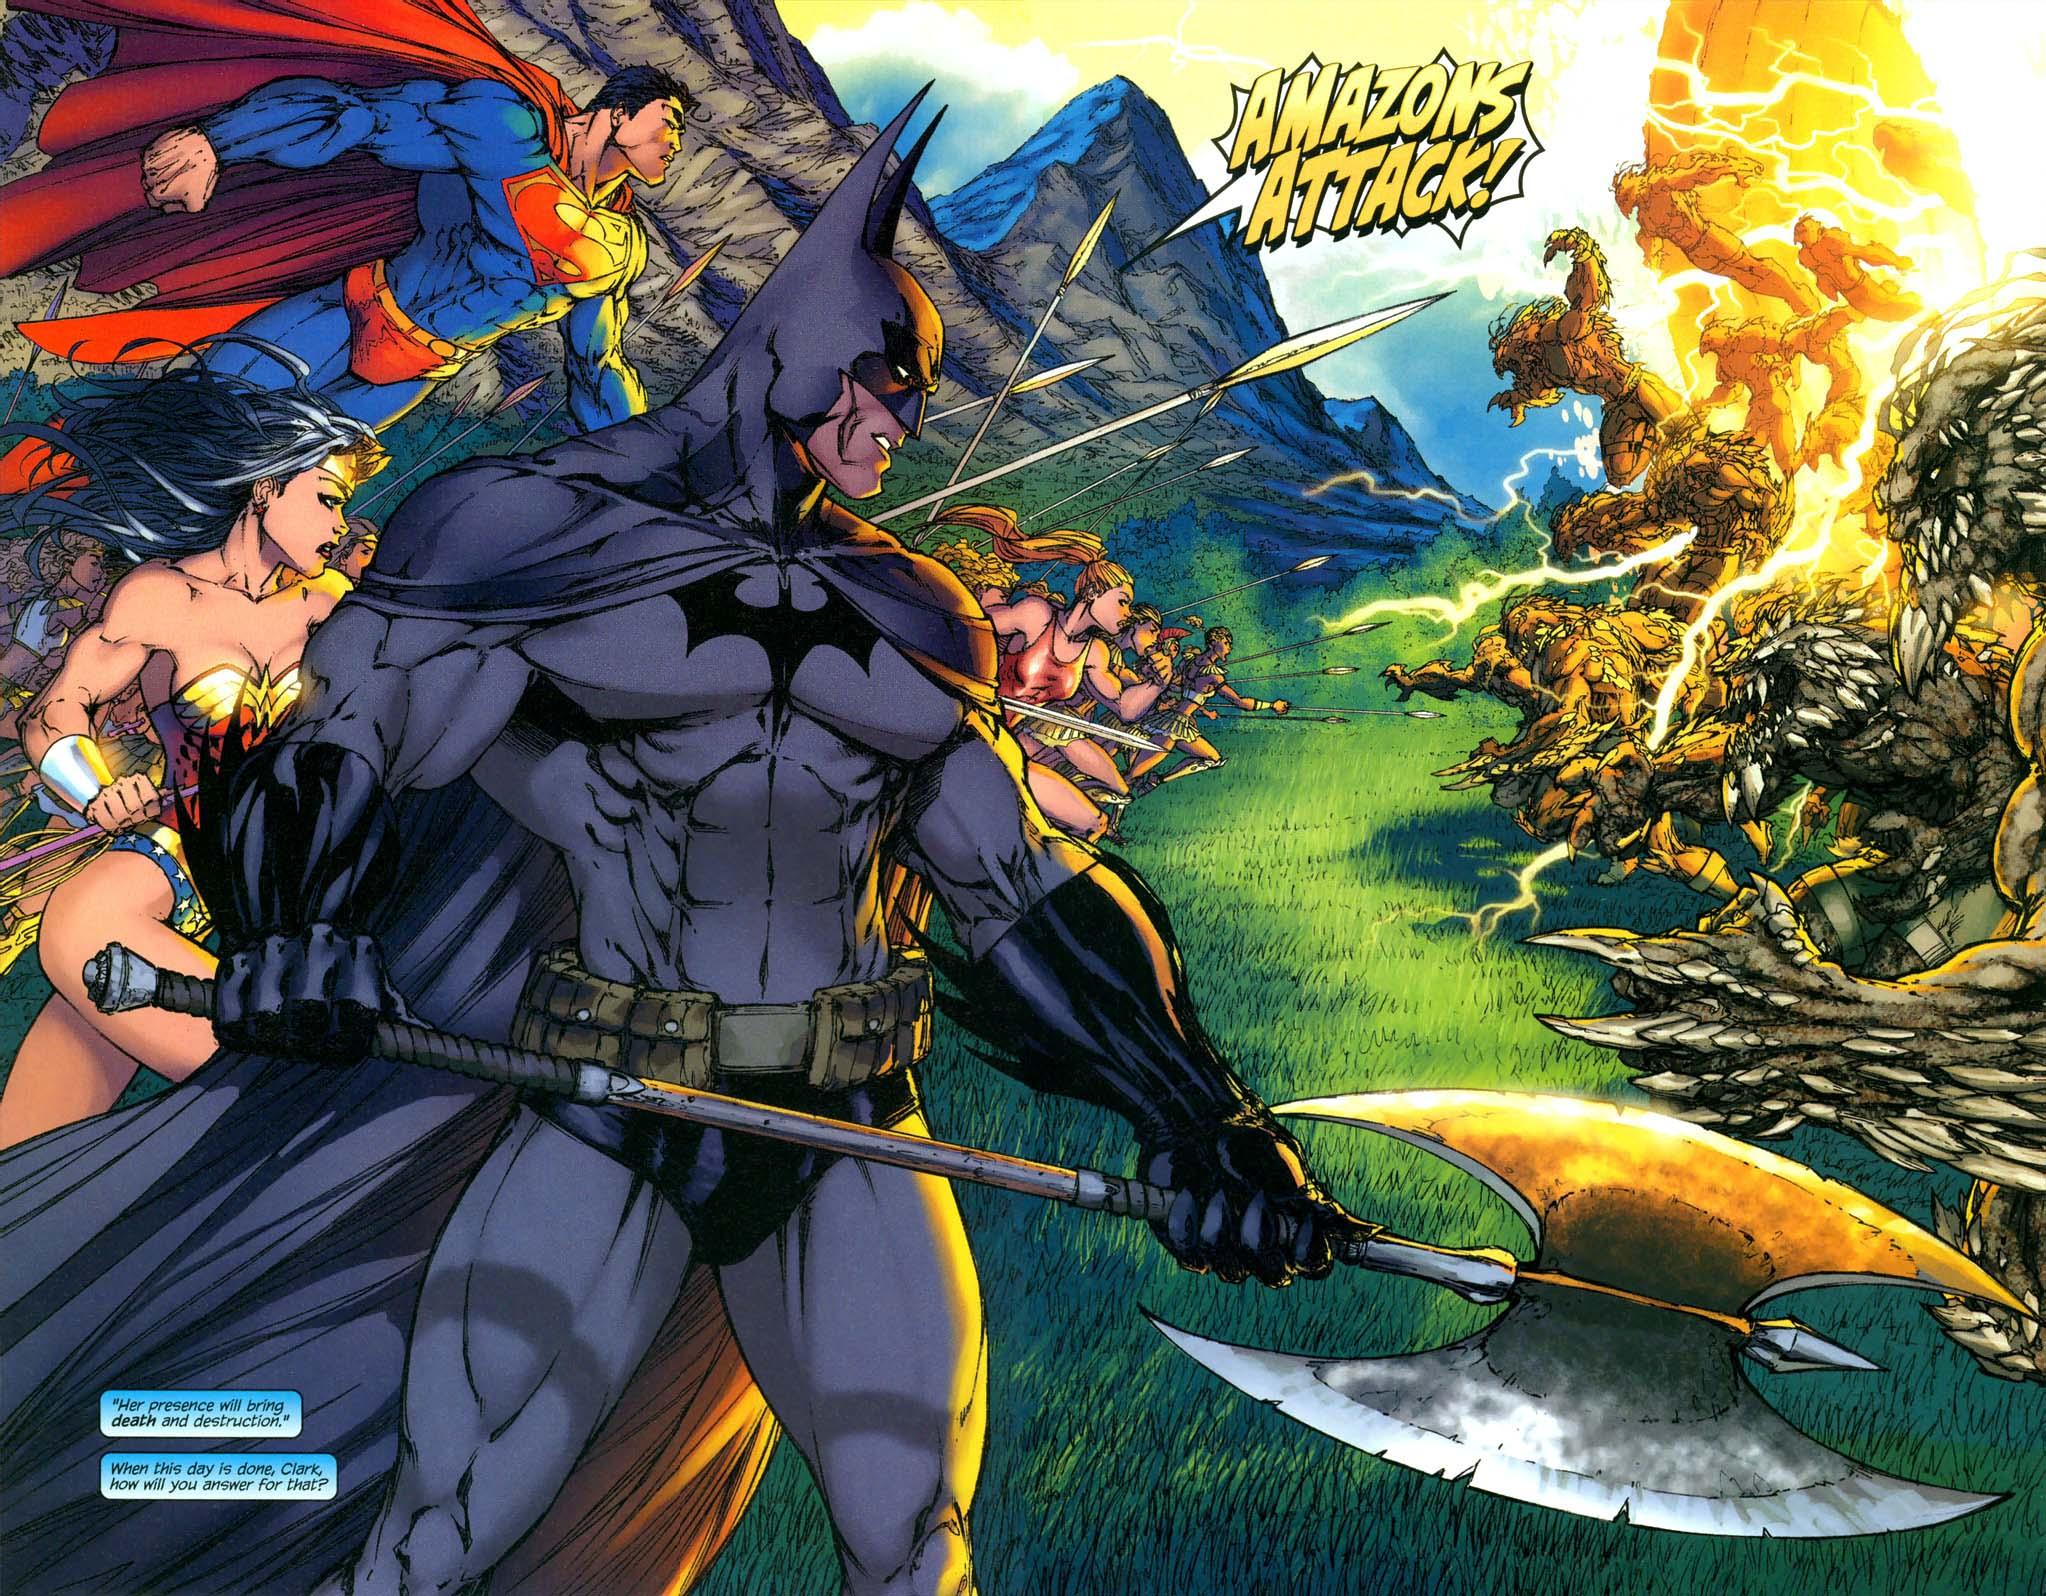 trinity and amazons vs army of doomsday